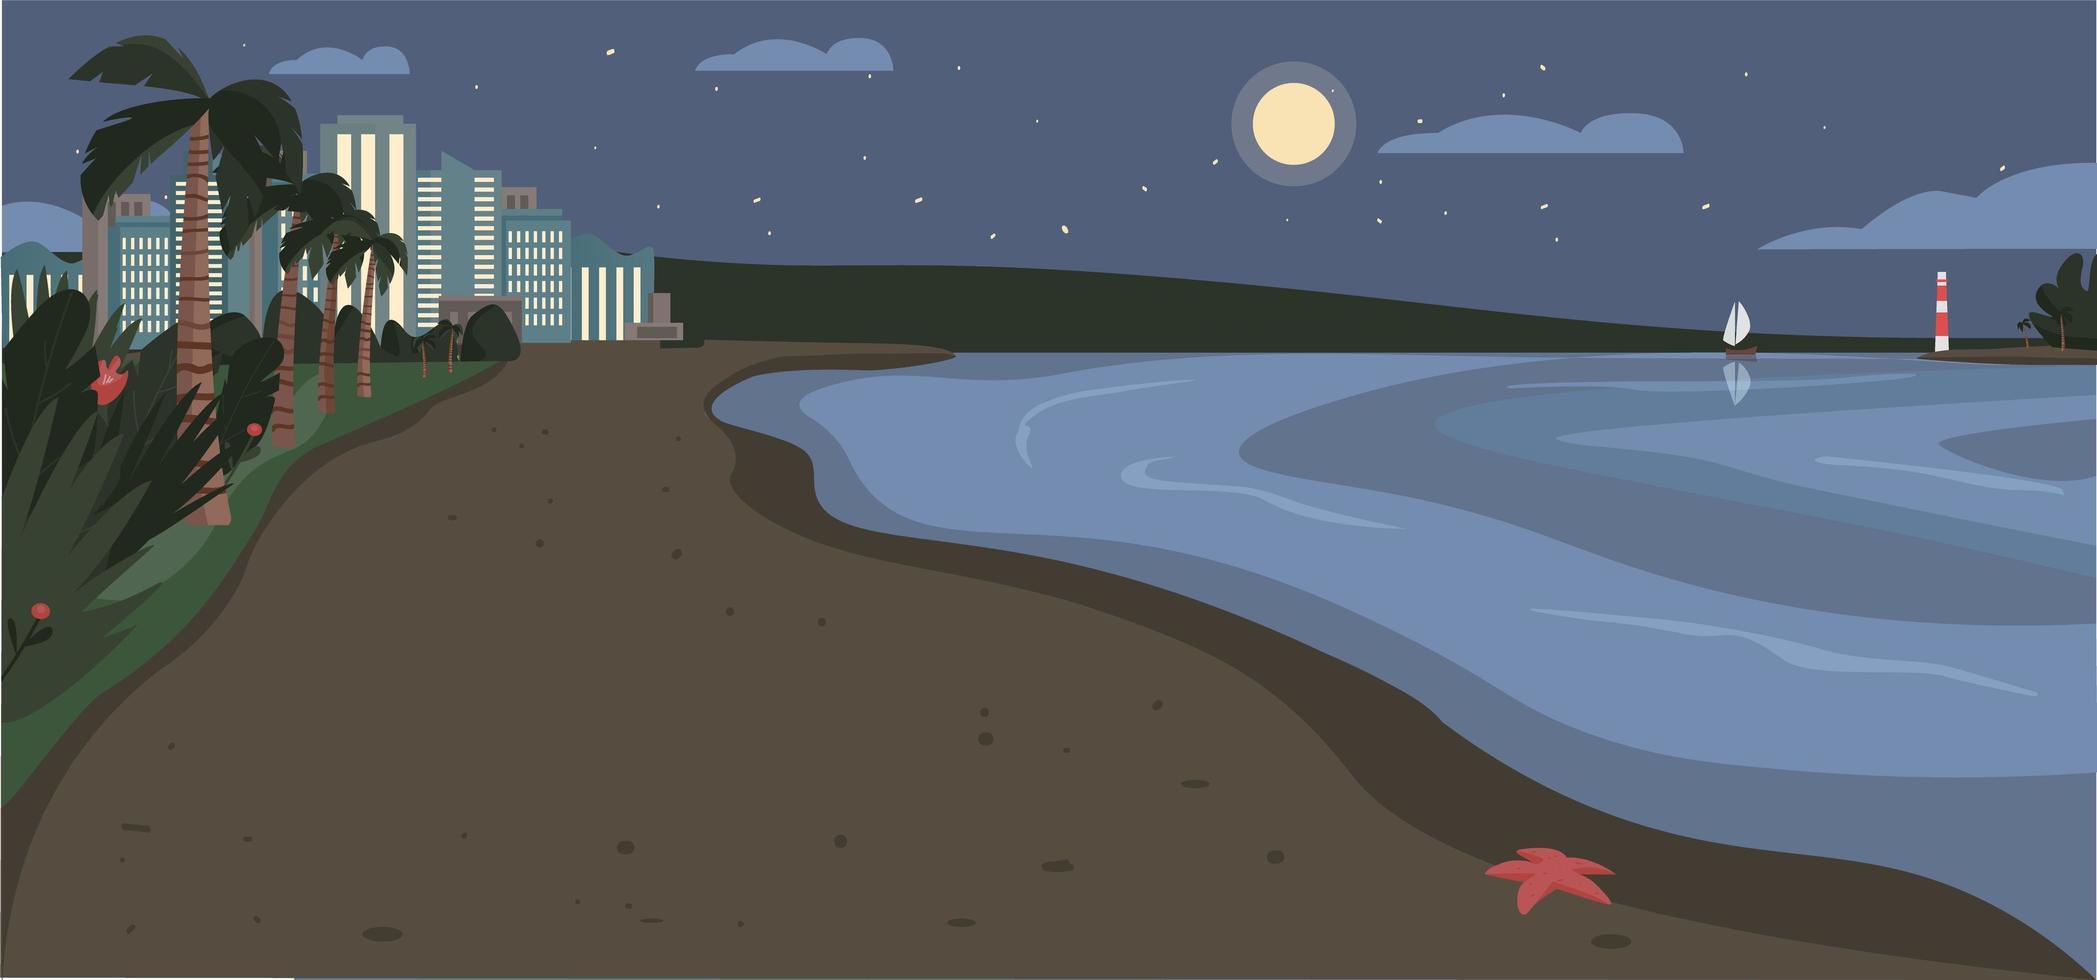 Sandstrand in der Nacht vektor